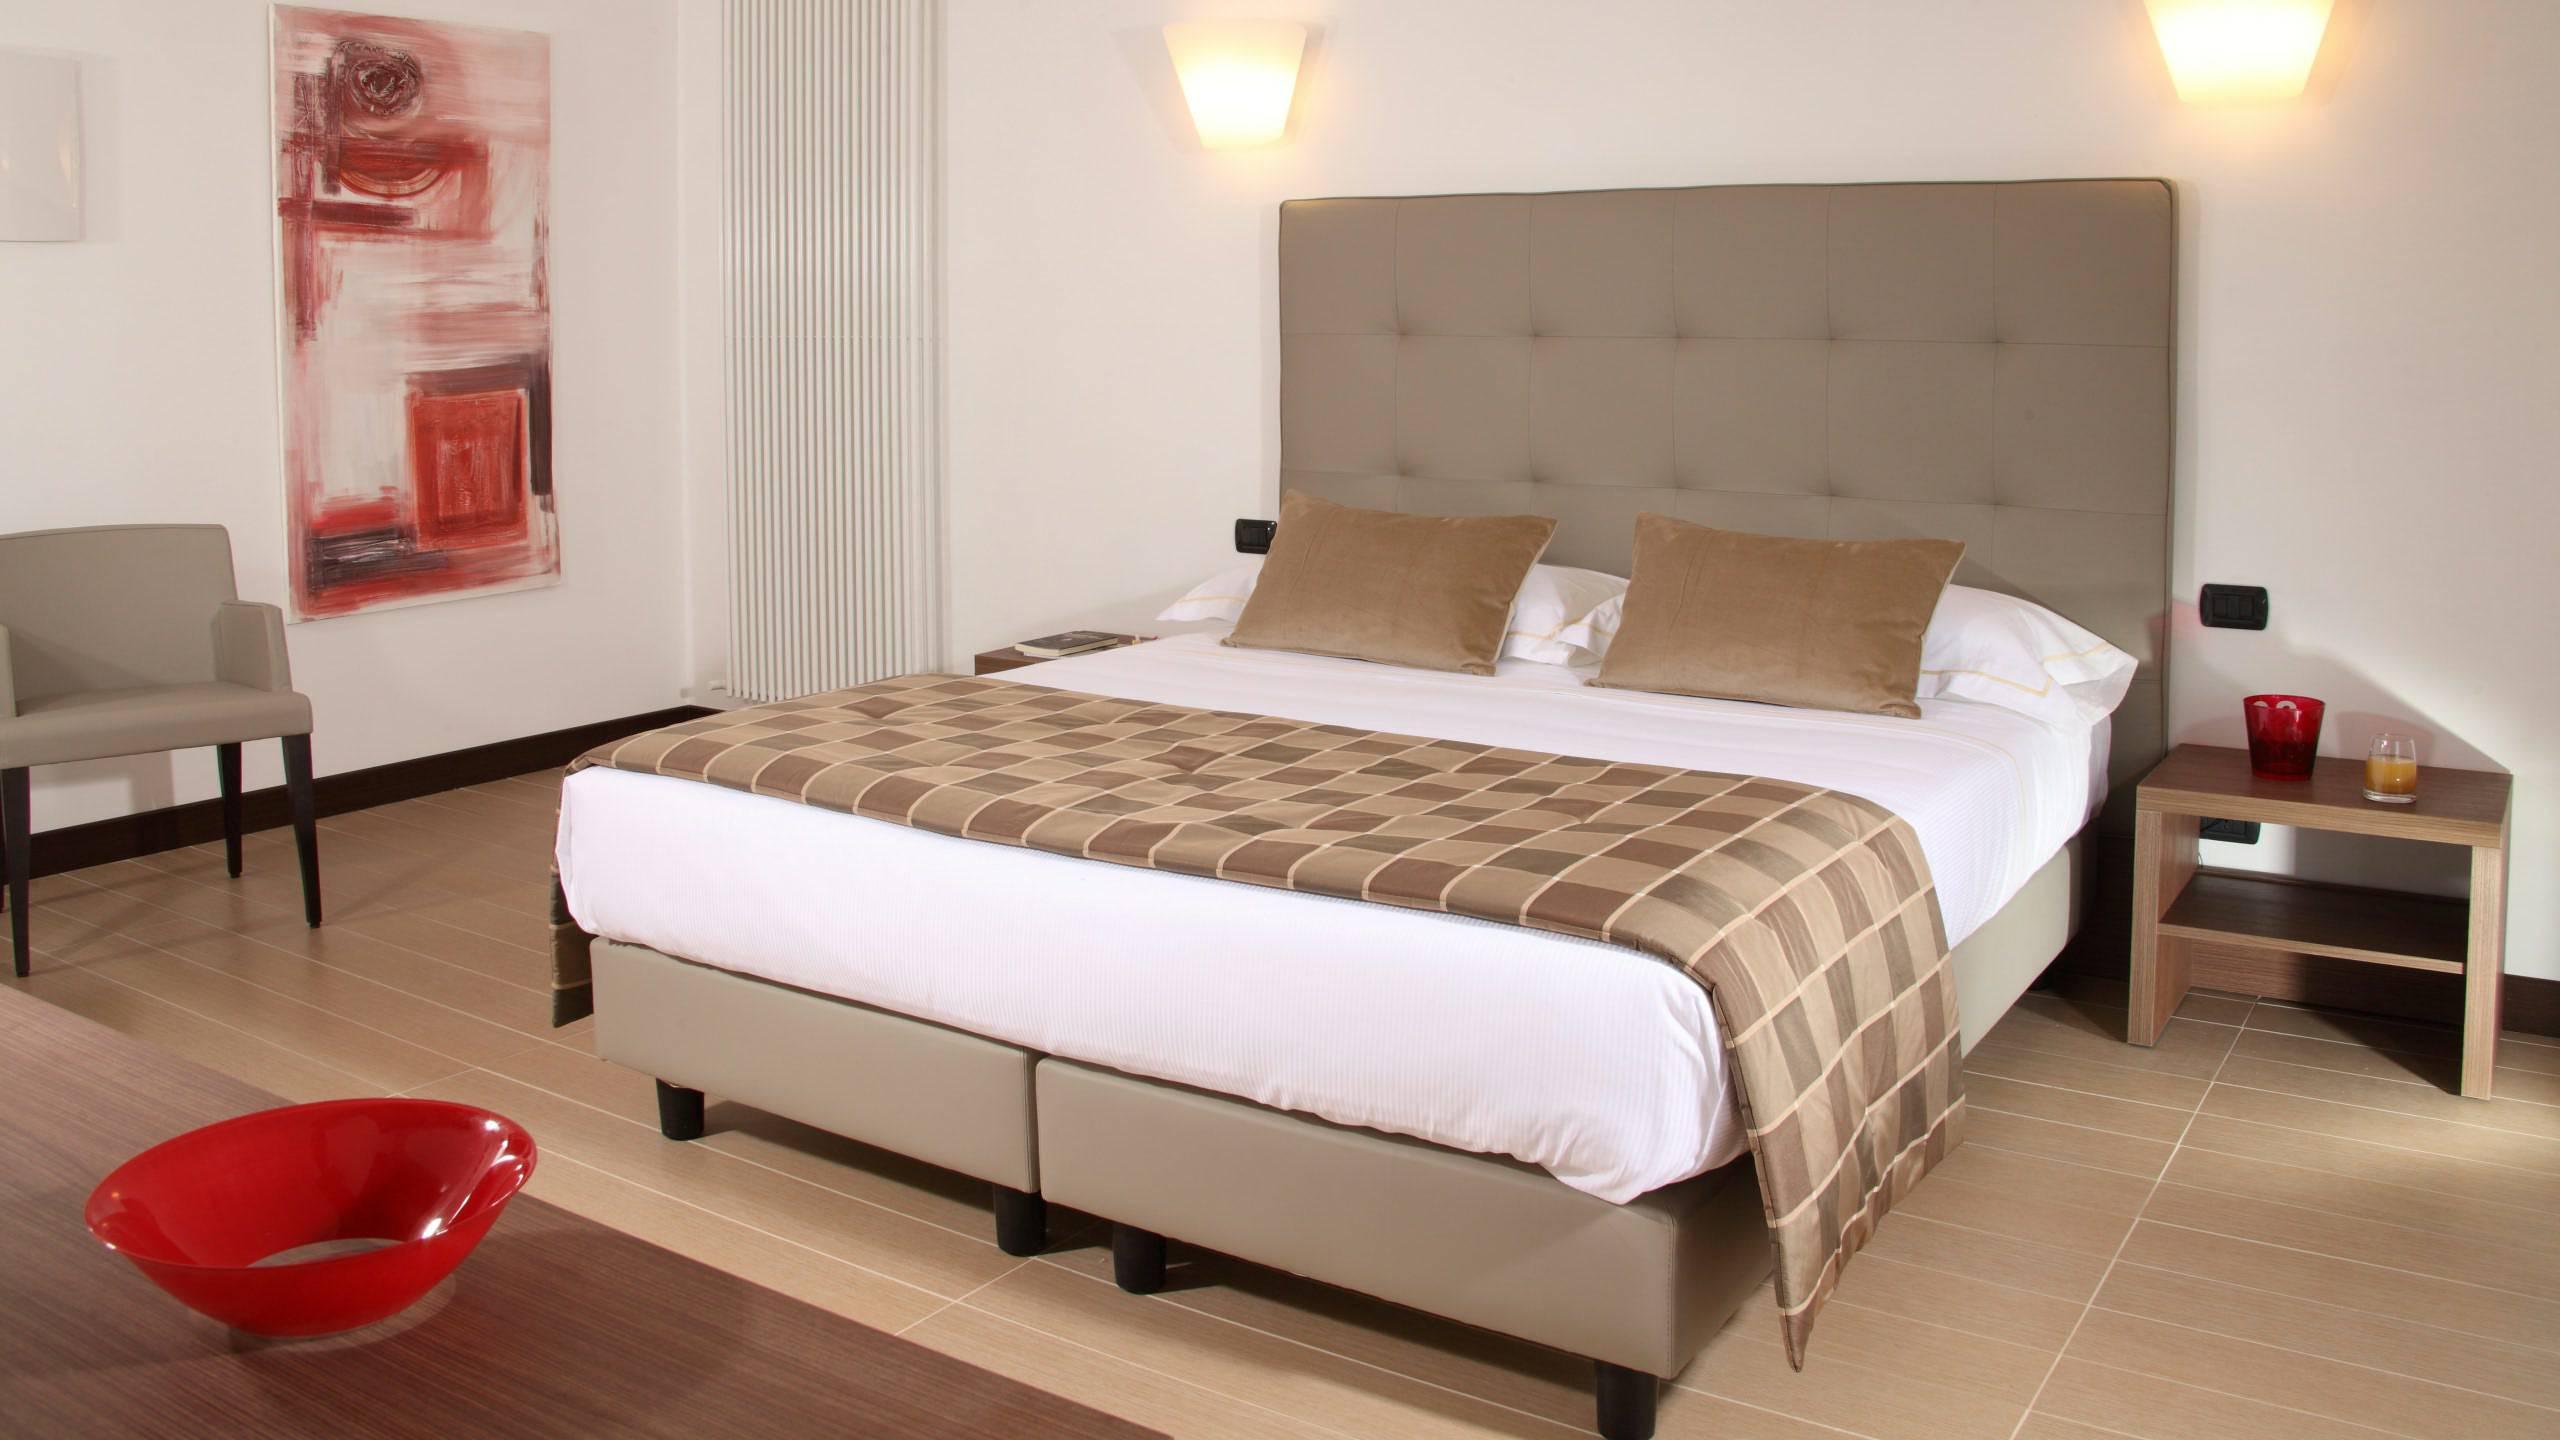 Residence hotel parioli roma camera standard for Camera roma